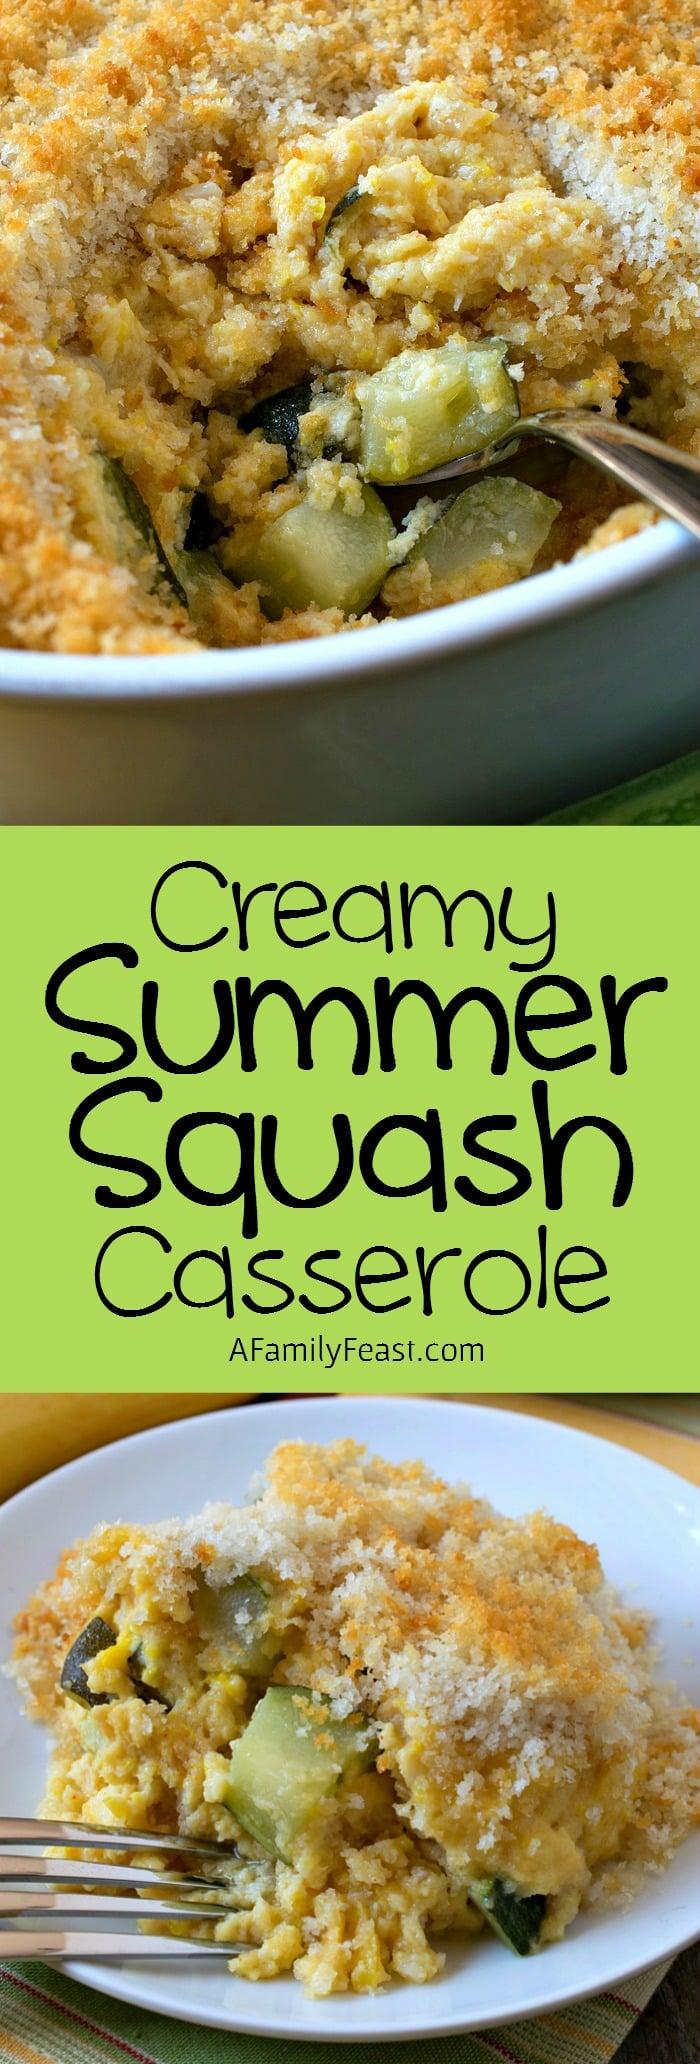 Creamy Summer Squash Casserole A Family Feast 174